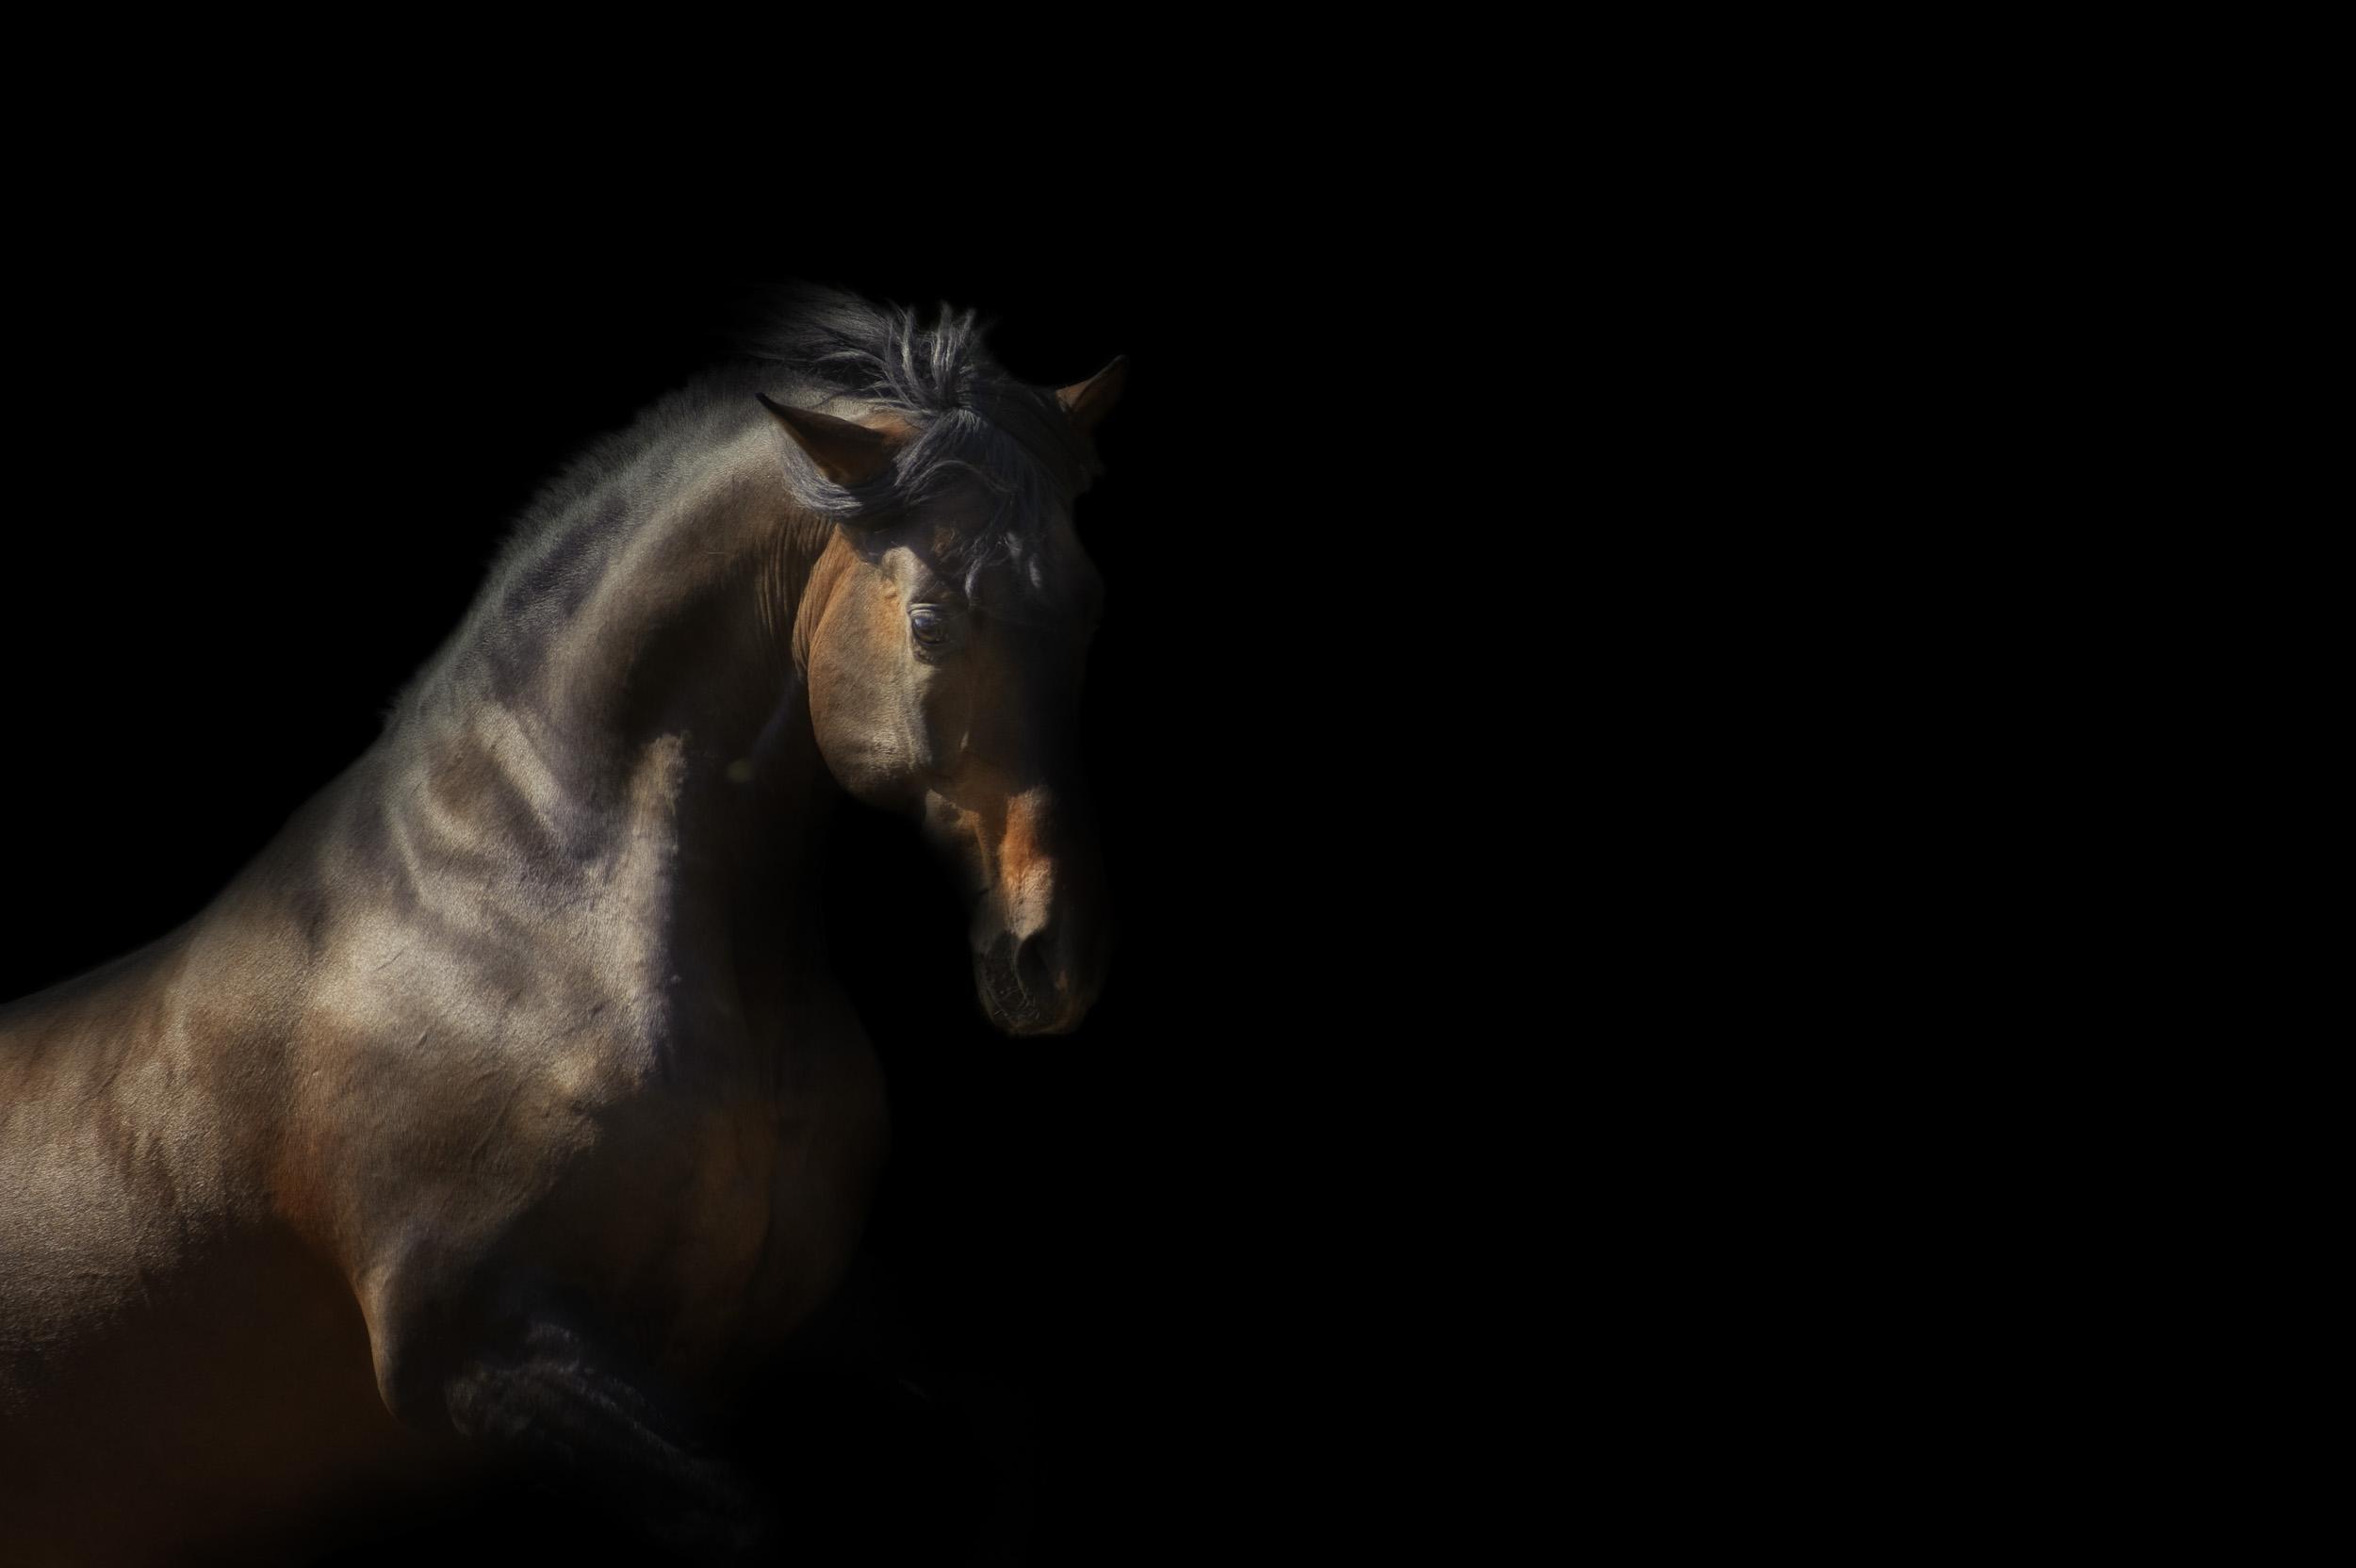 cheval espagnol nathalie hupin photographie équestre